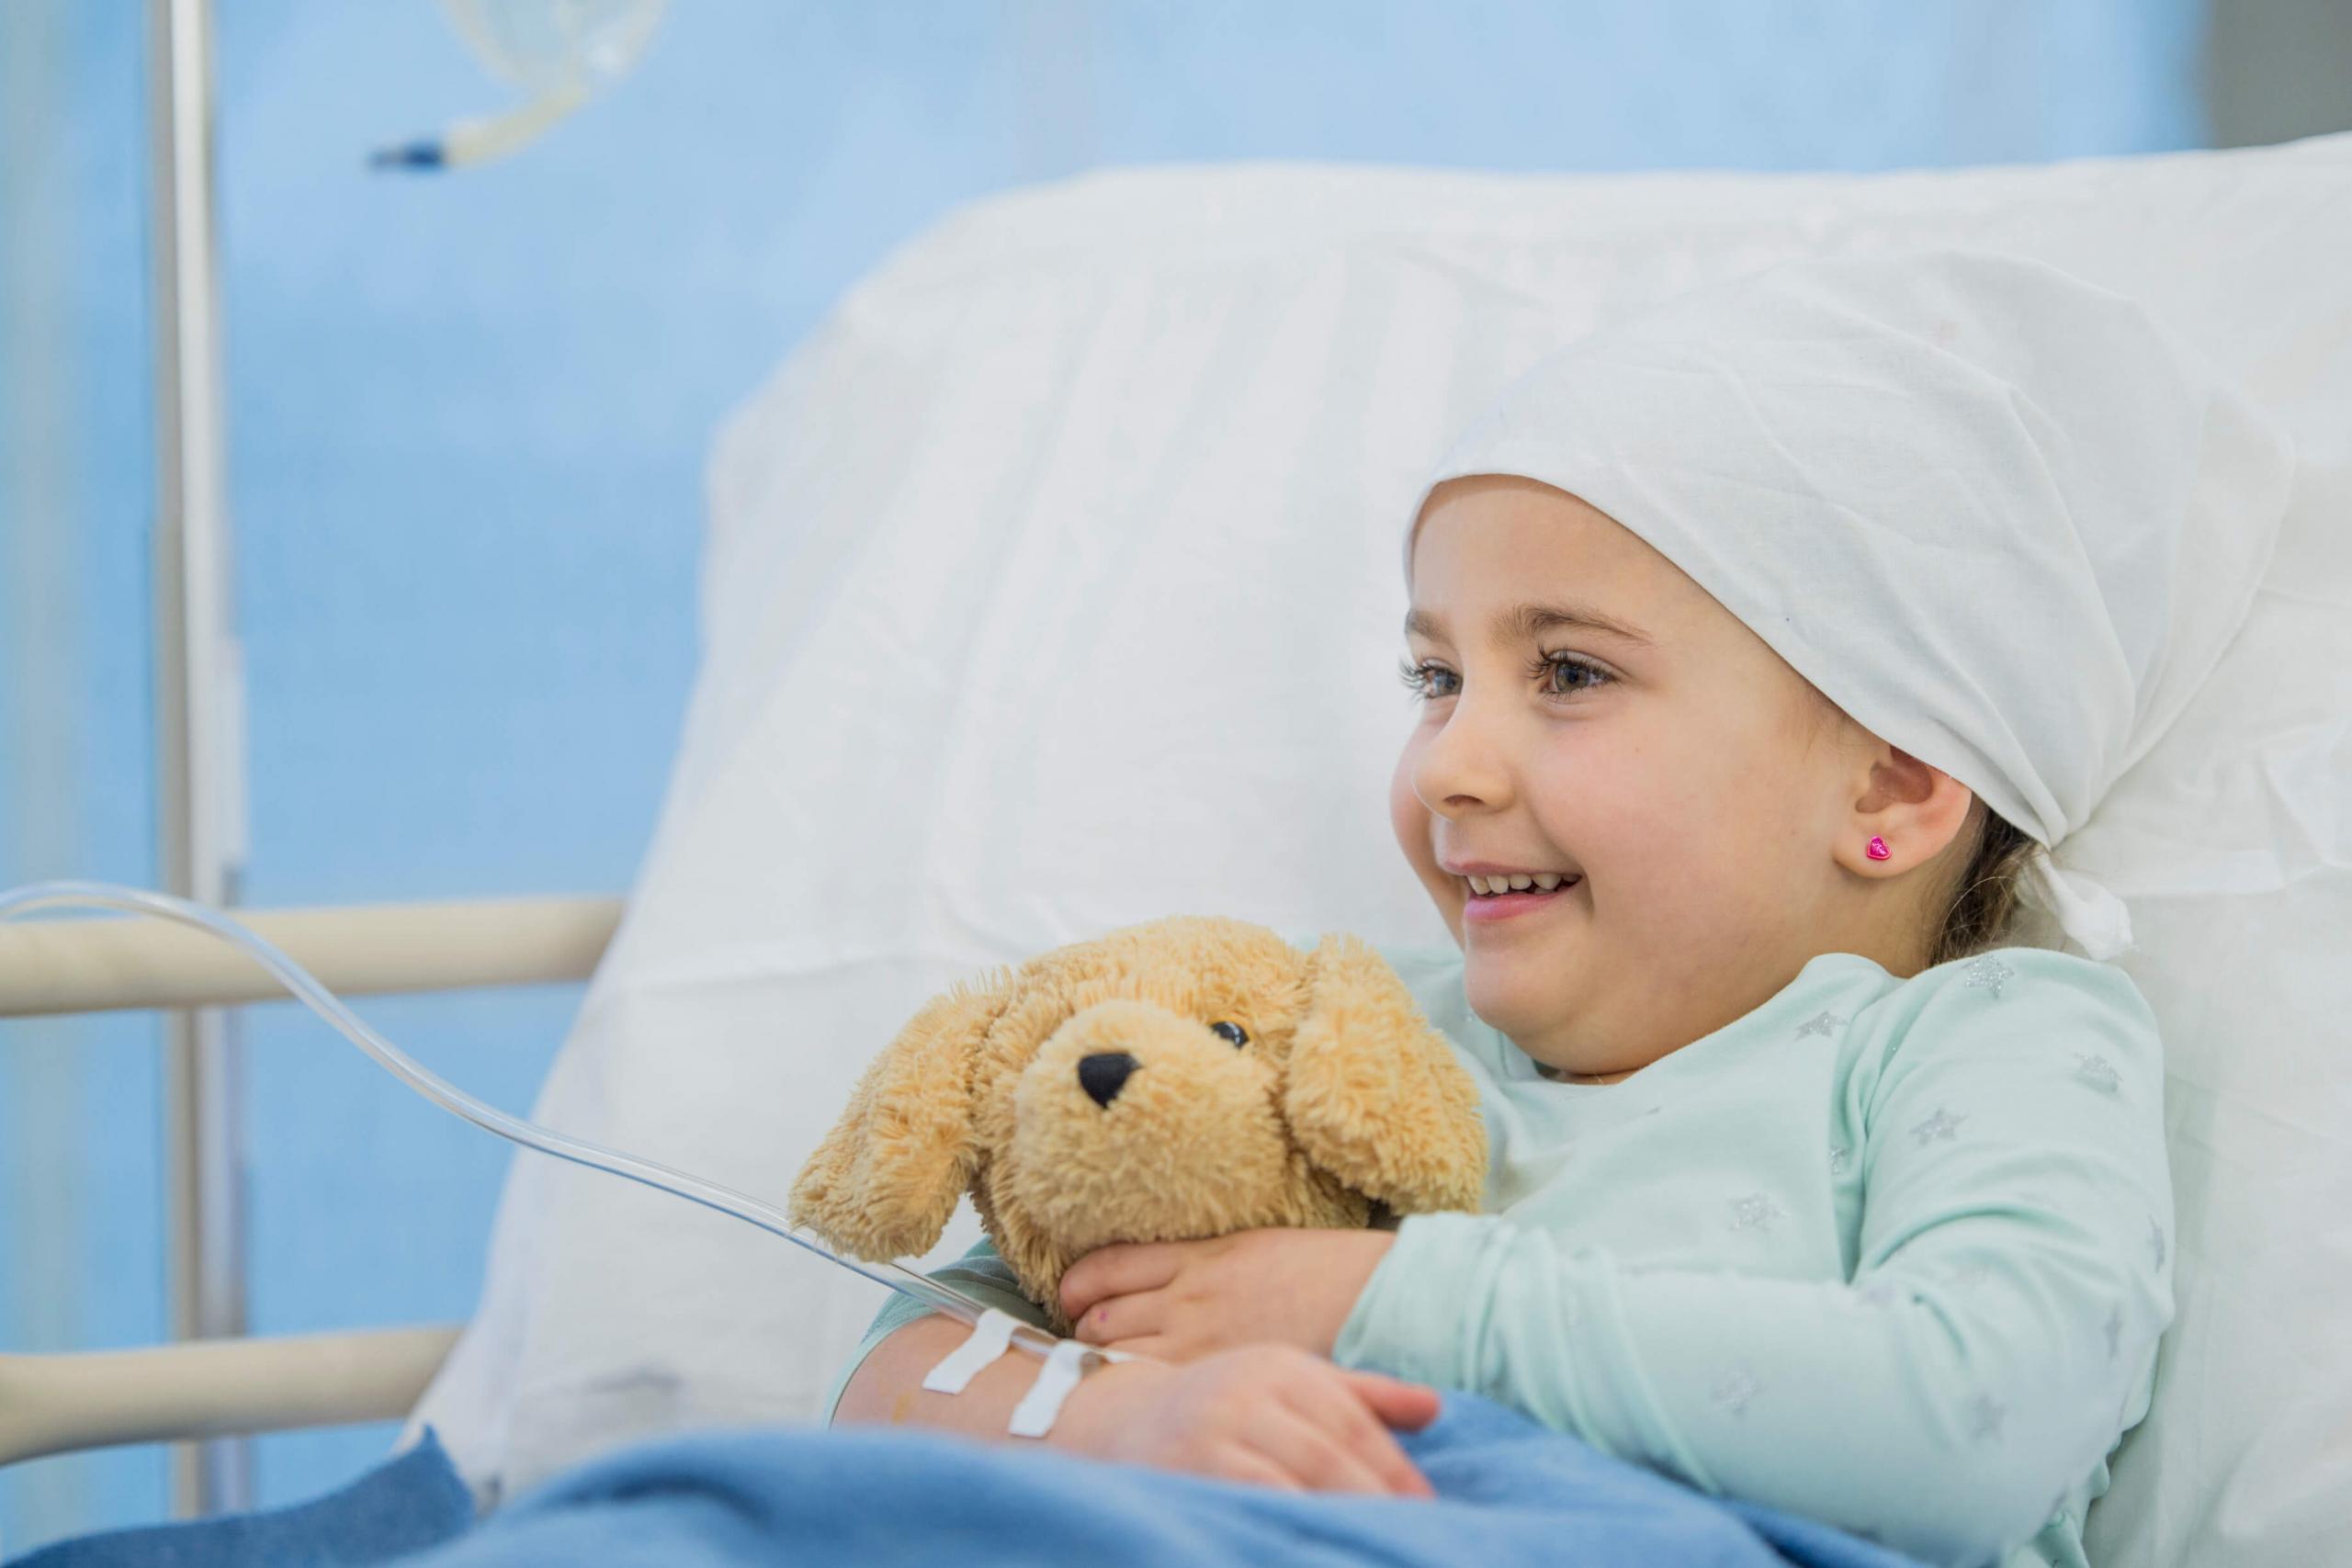 Kindertumorchirurgie - Titelbild